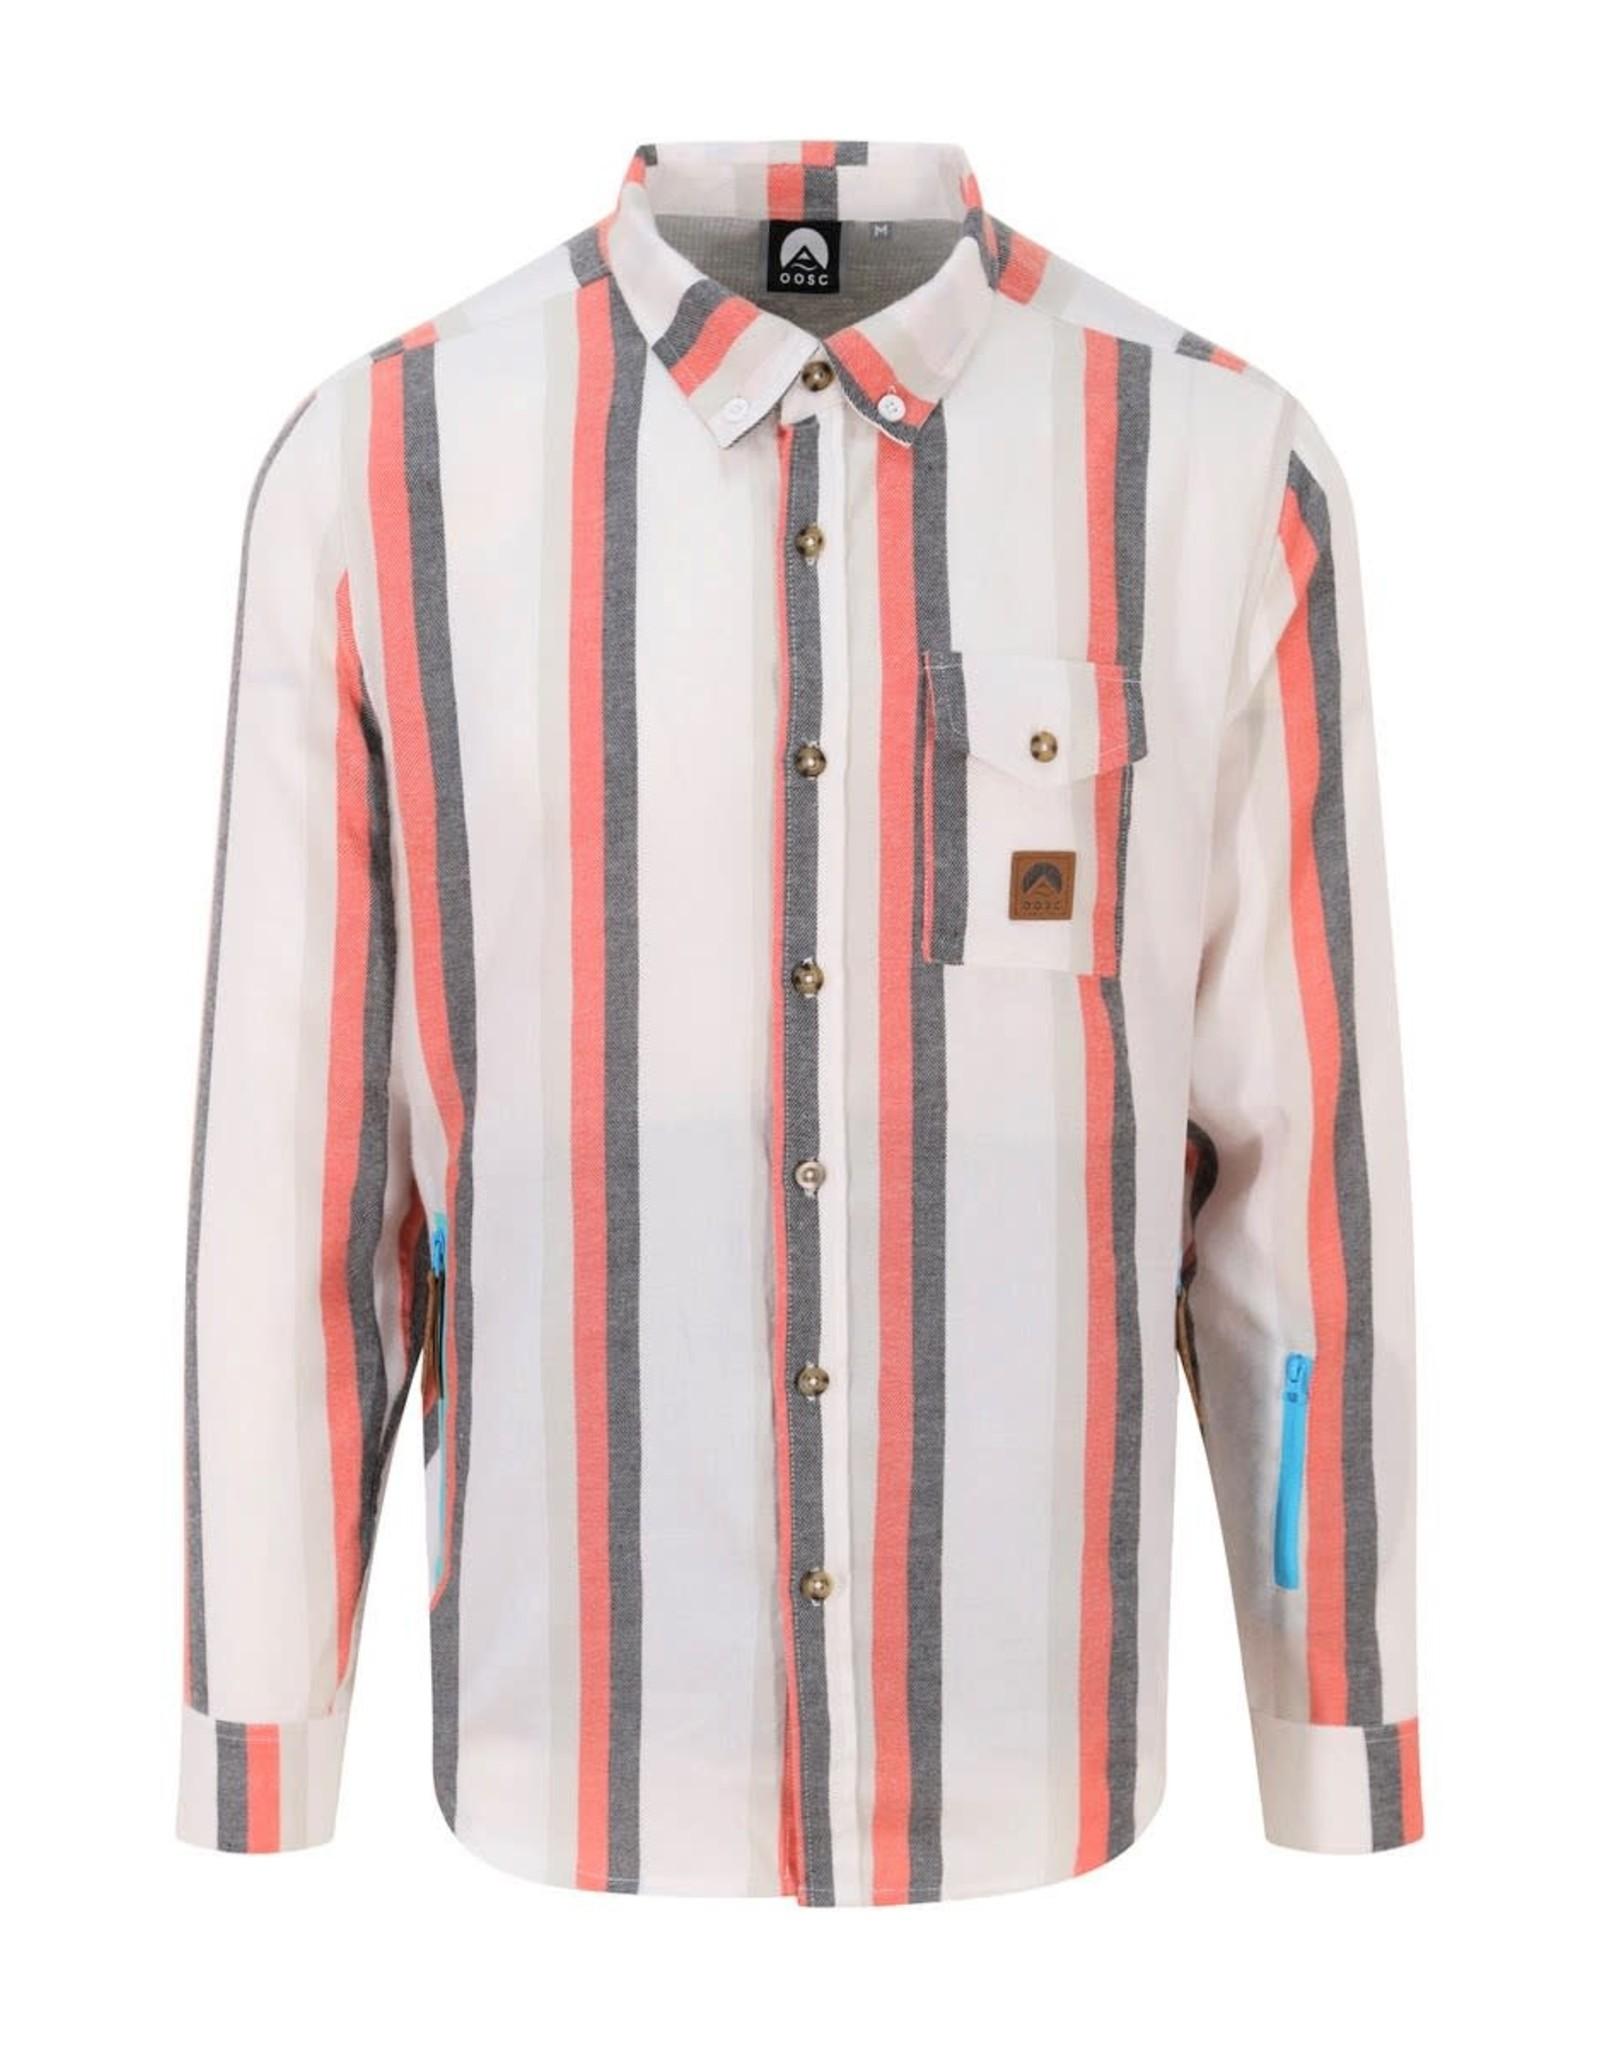 OOSC Fresh Pow Riding Shirt